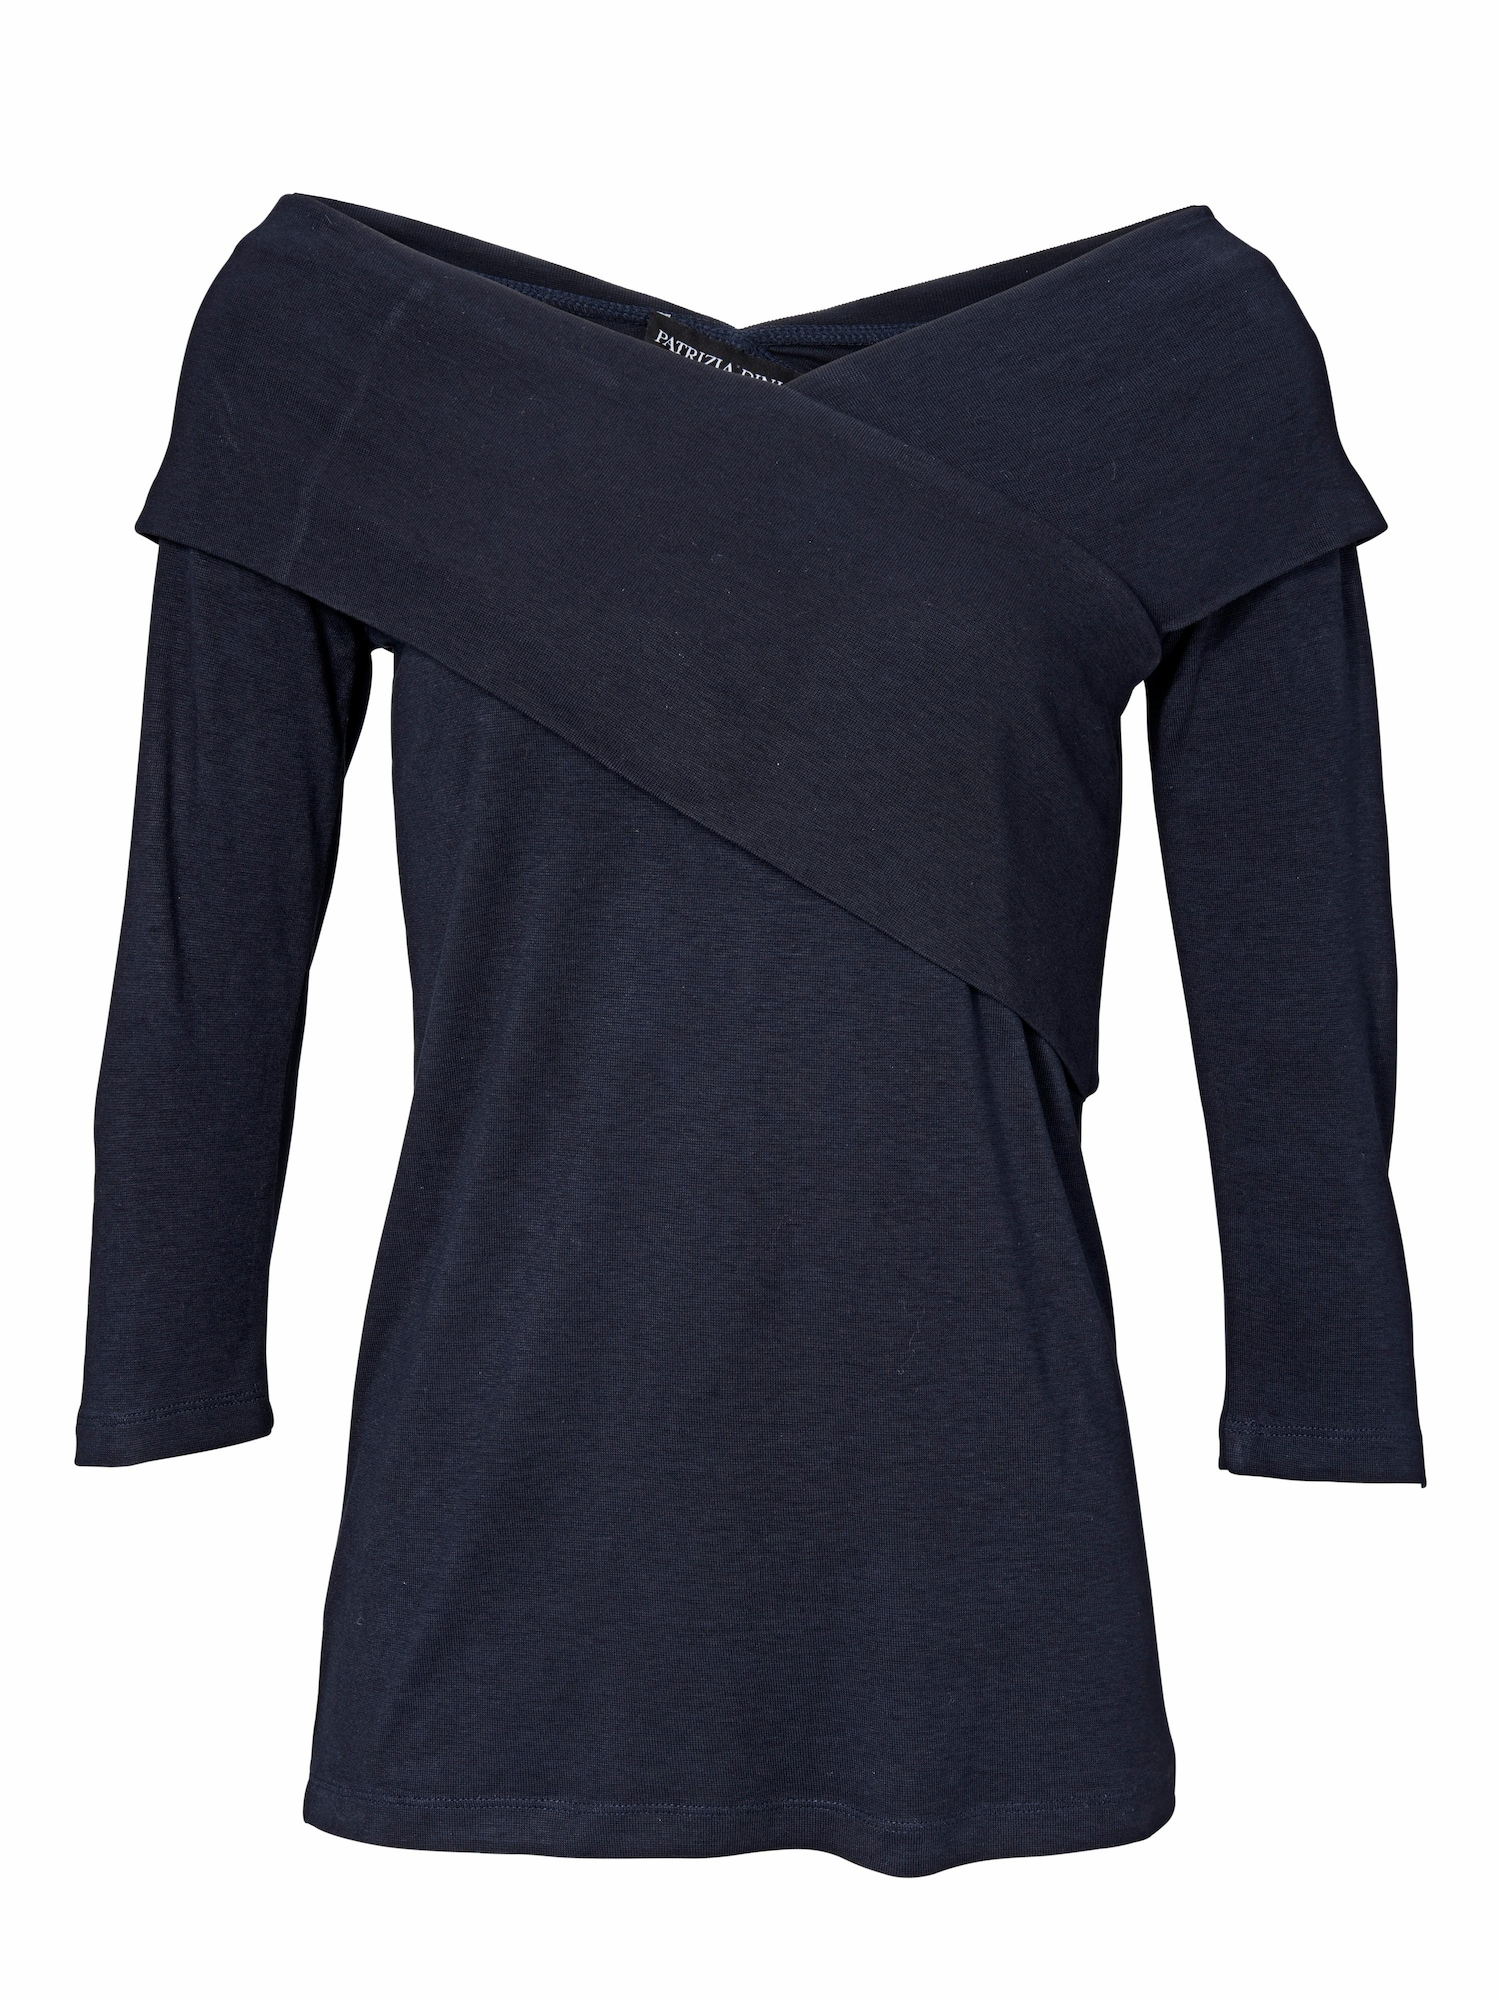 Wickelshirt 3/4-Arm | Bekleidung > Shirts > Wickelshirts | heine